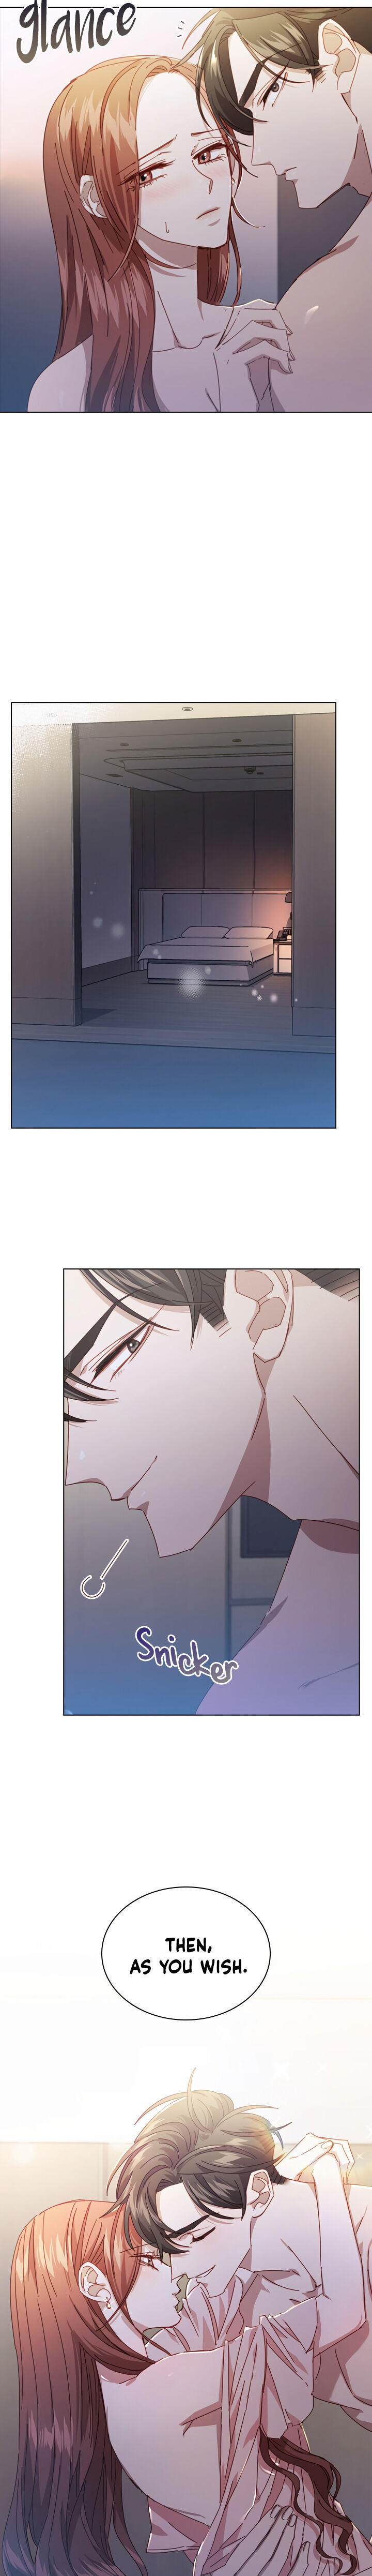 A Beastly Scandal Chapter 52 page 14 - Mangakakalots.com